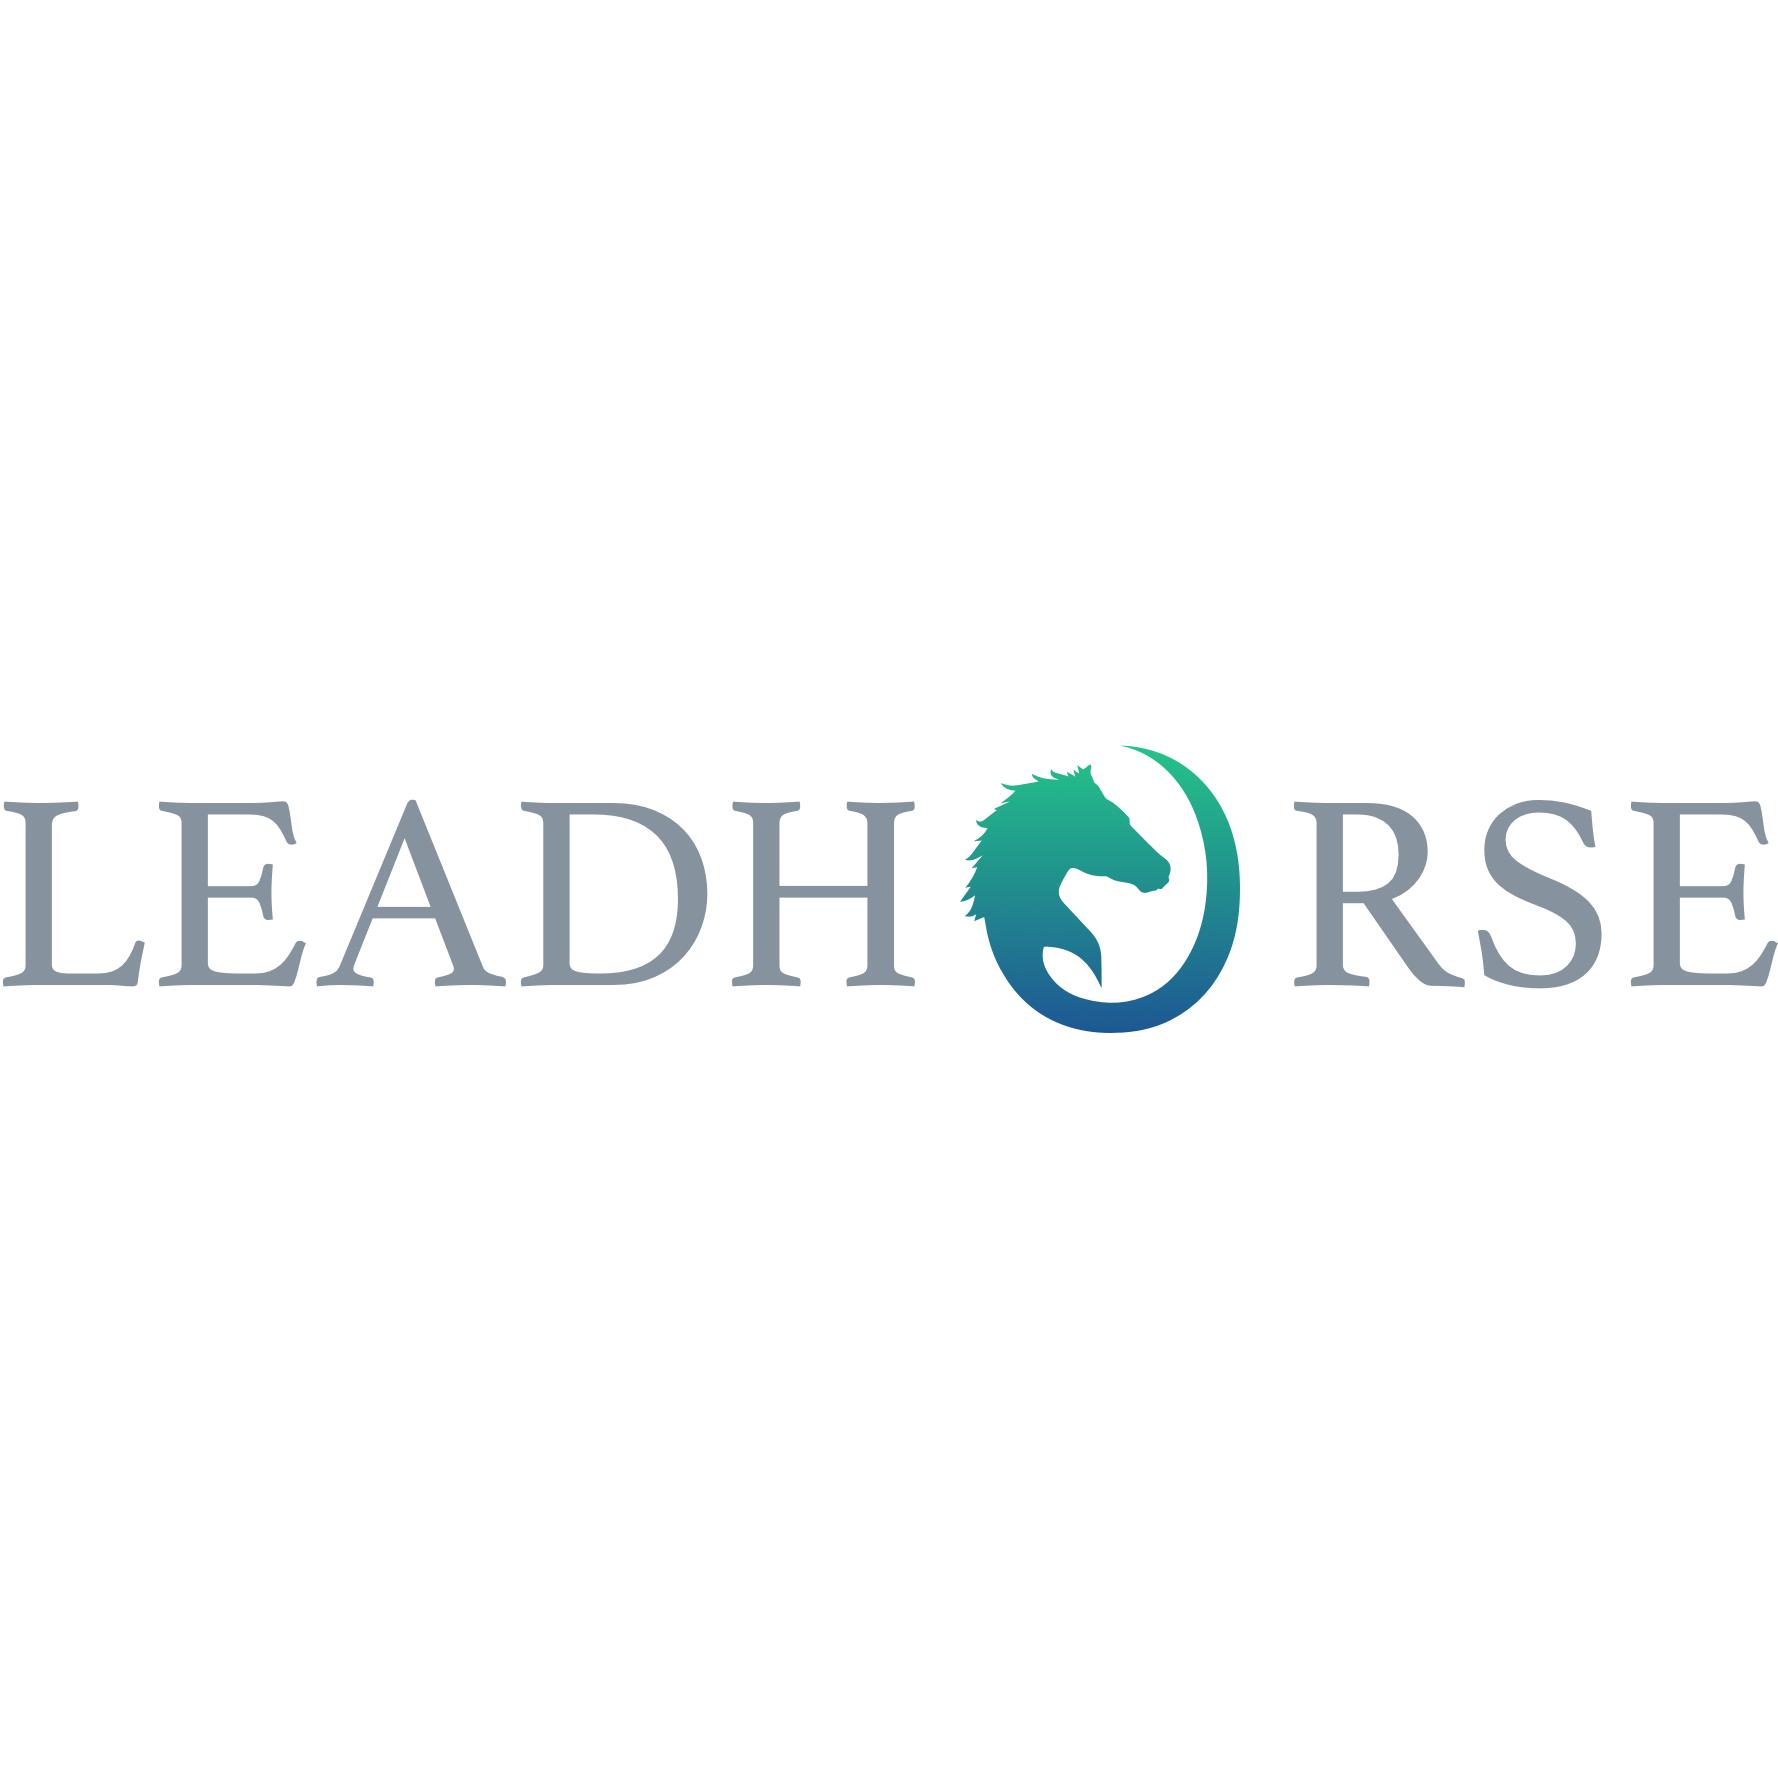 Lead Horse Marketing - Atlanta, GA 30308 - (855)239-4569 | ShowMeLocal.com